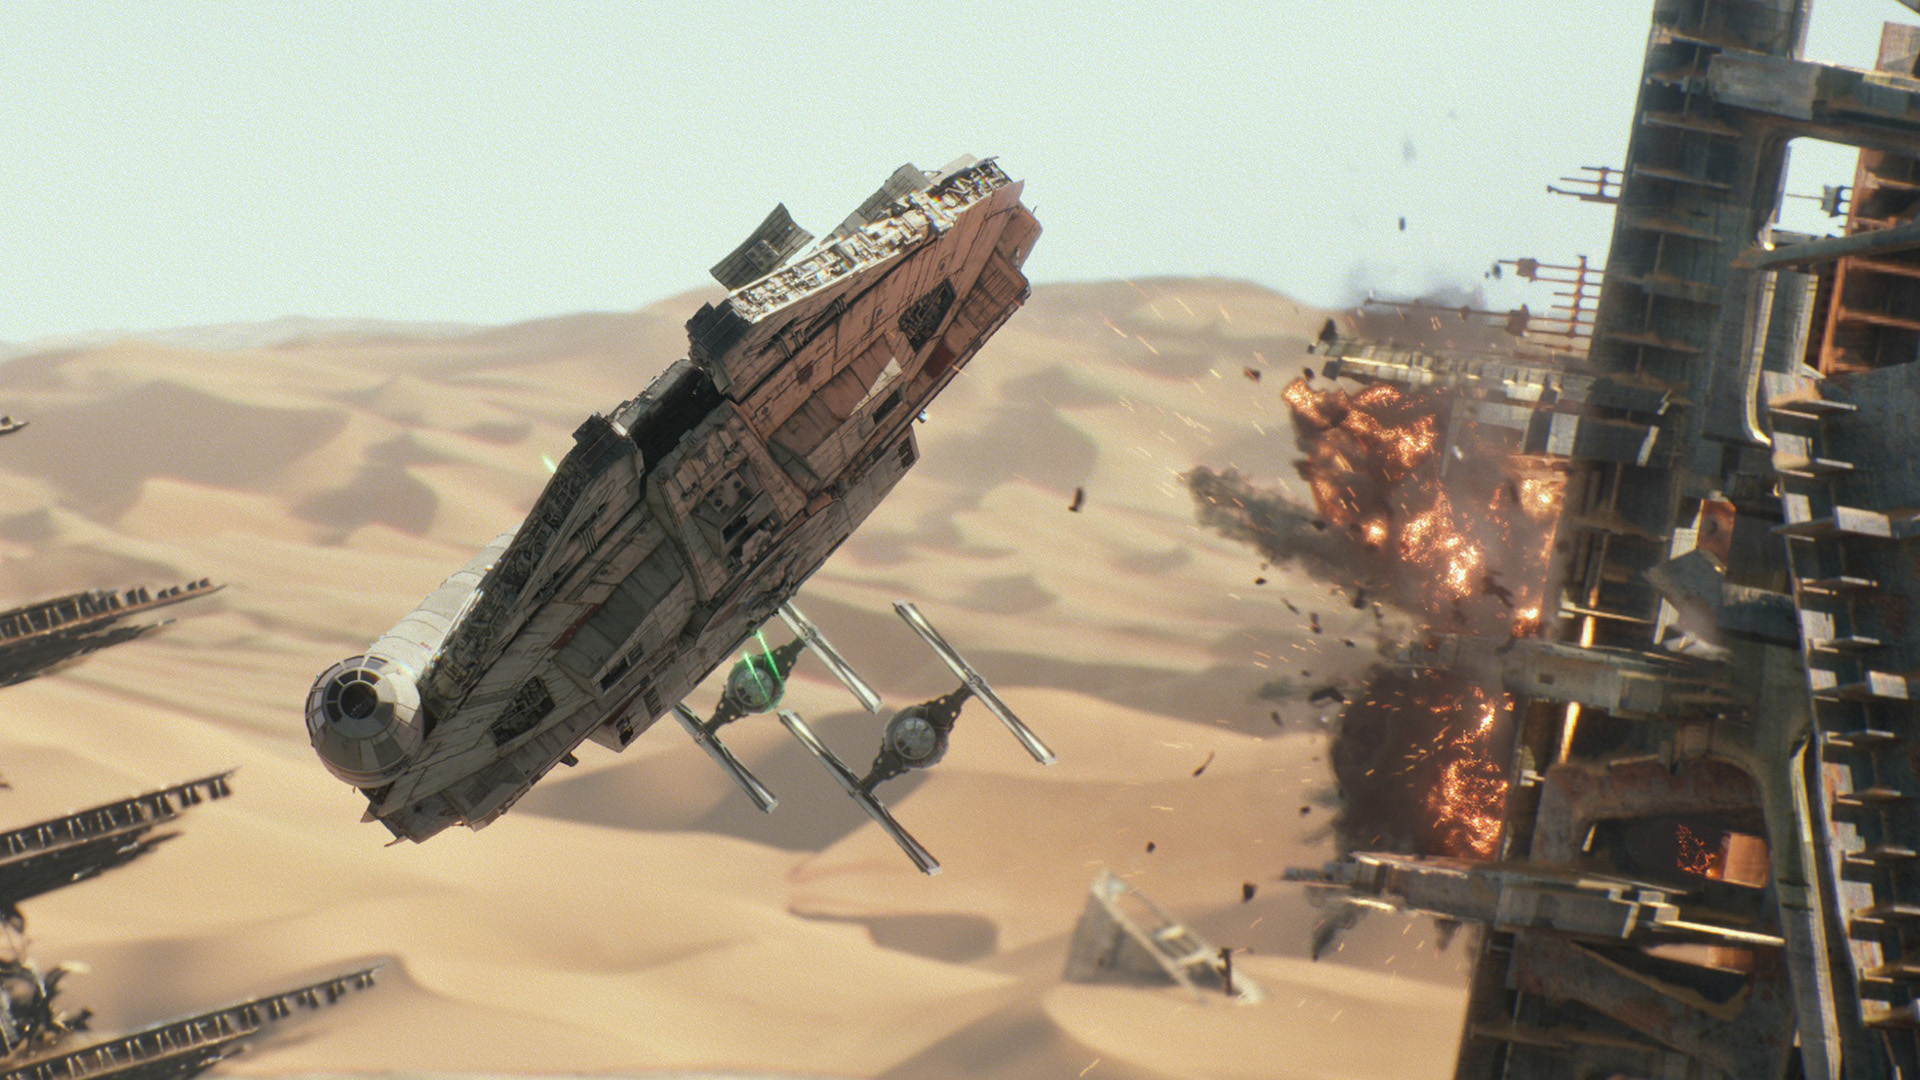 The_Force_Awakens_Falcon